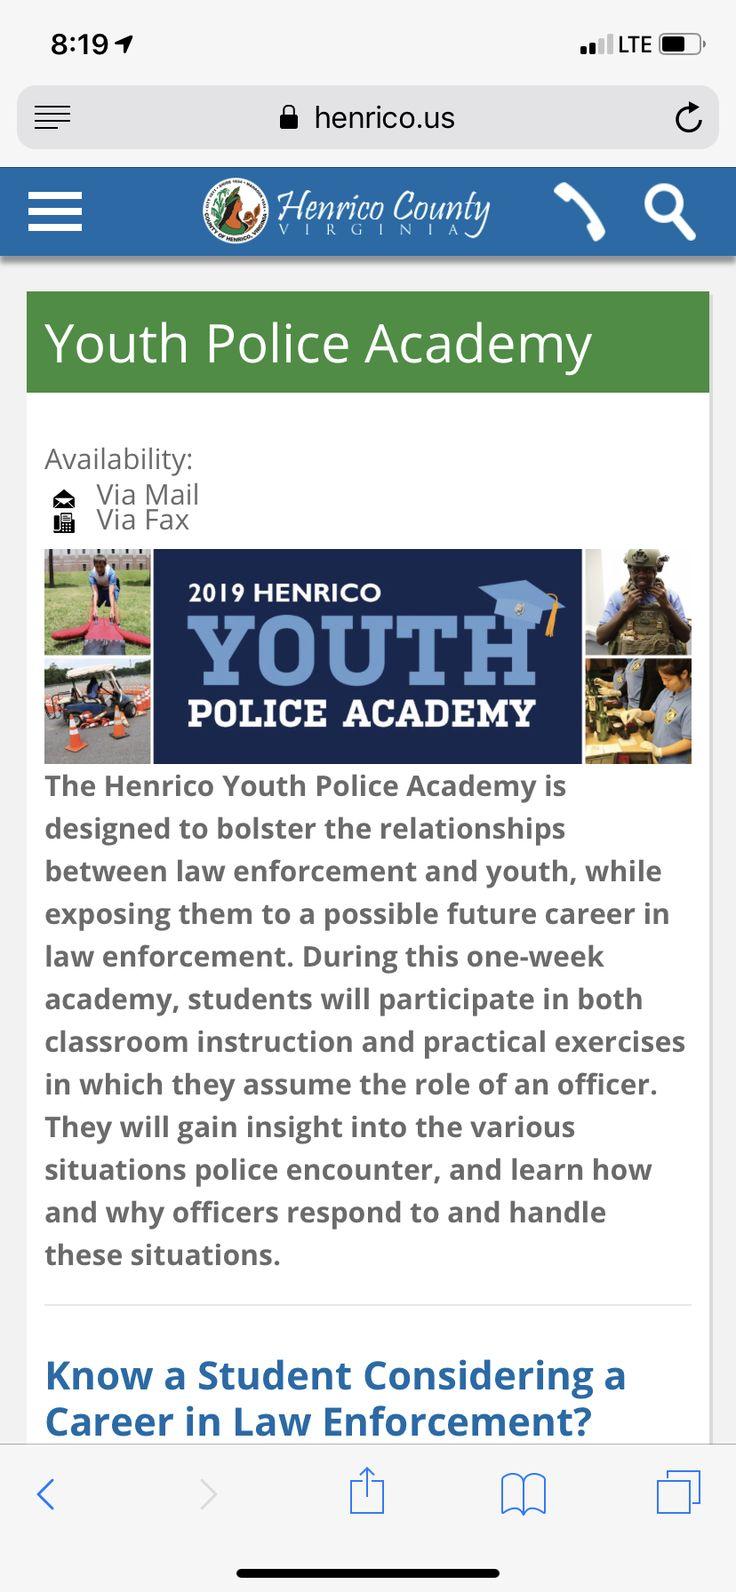 Henrico cty Future career, Police academy, Henrico county